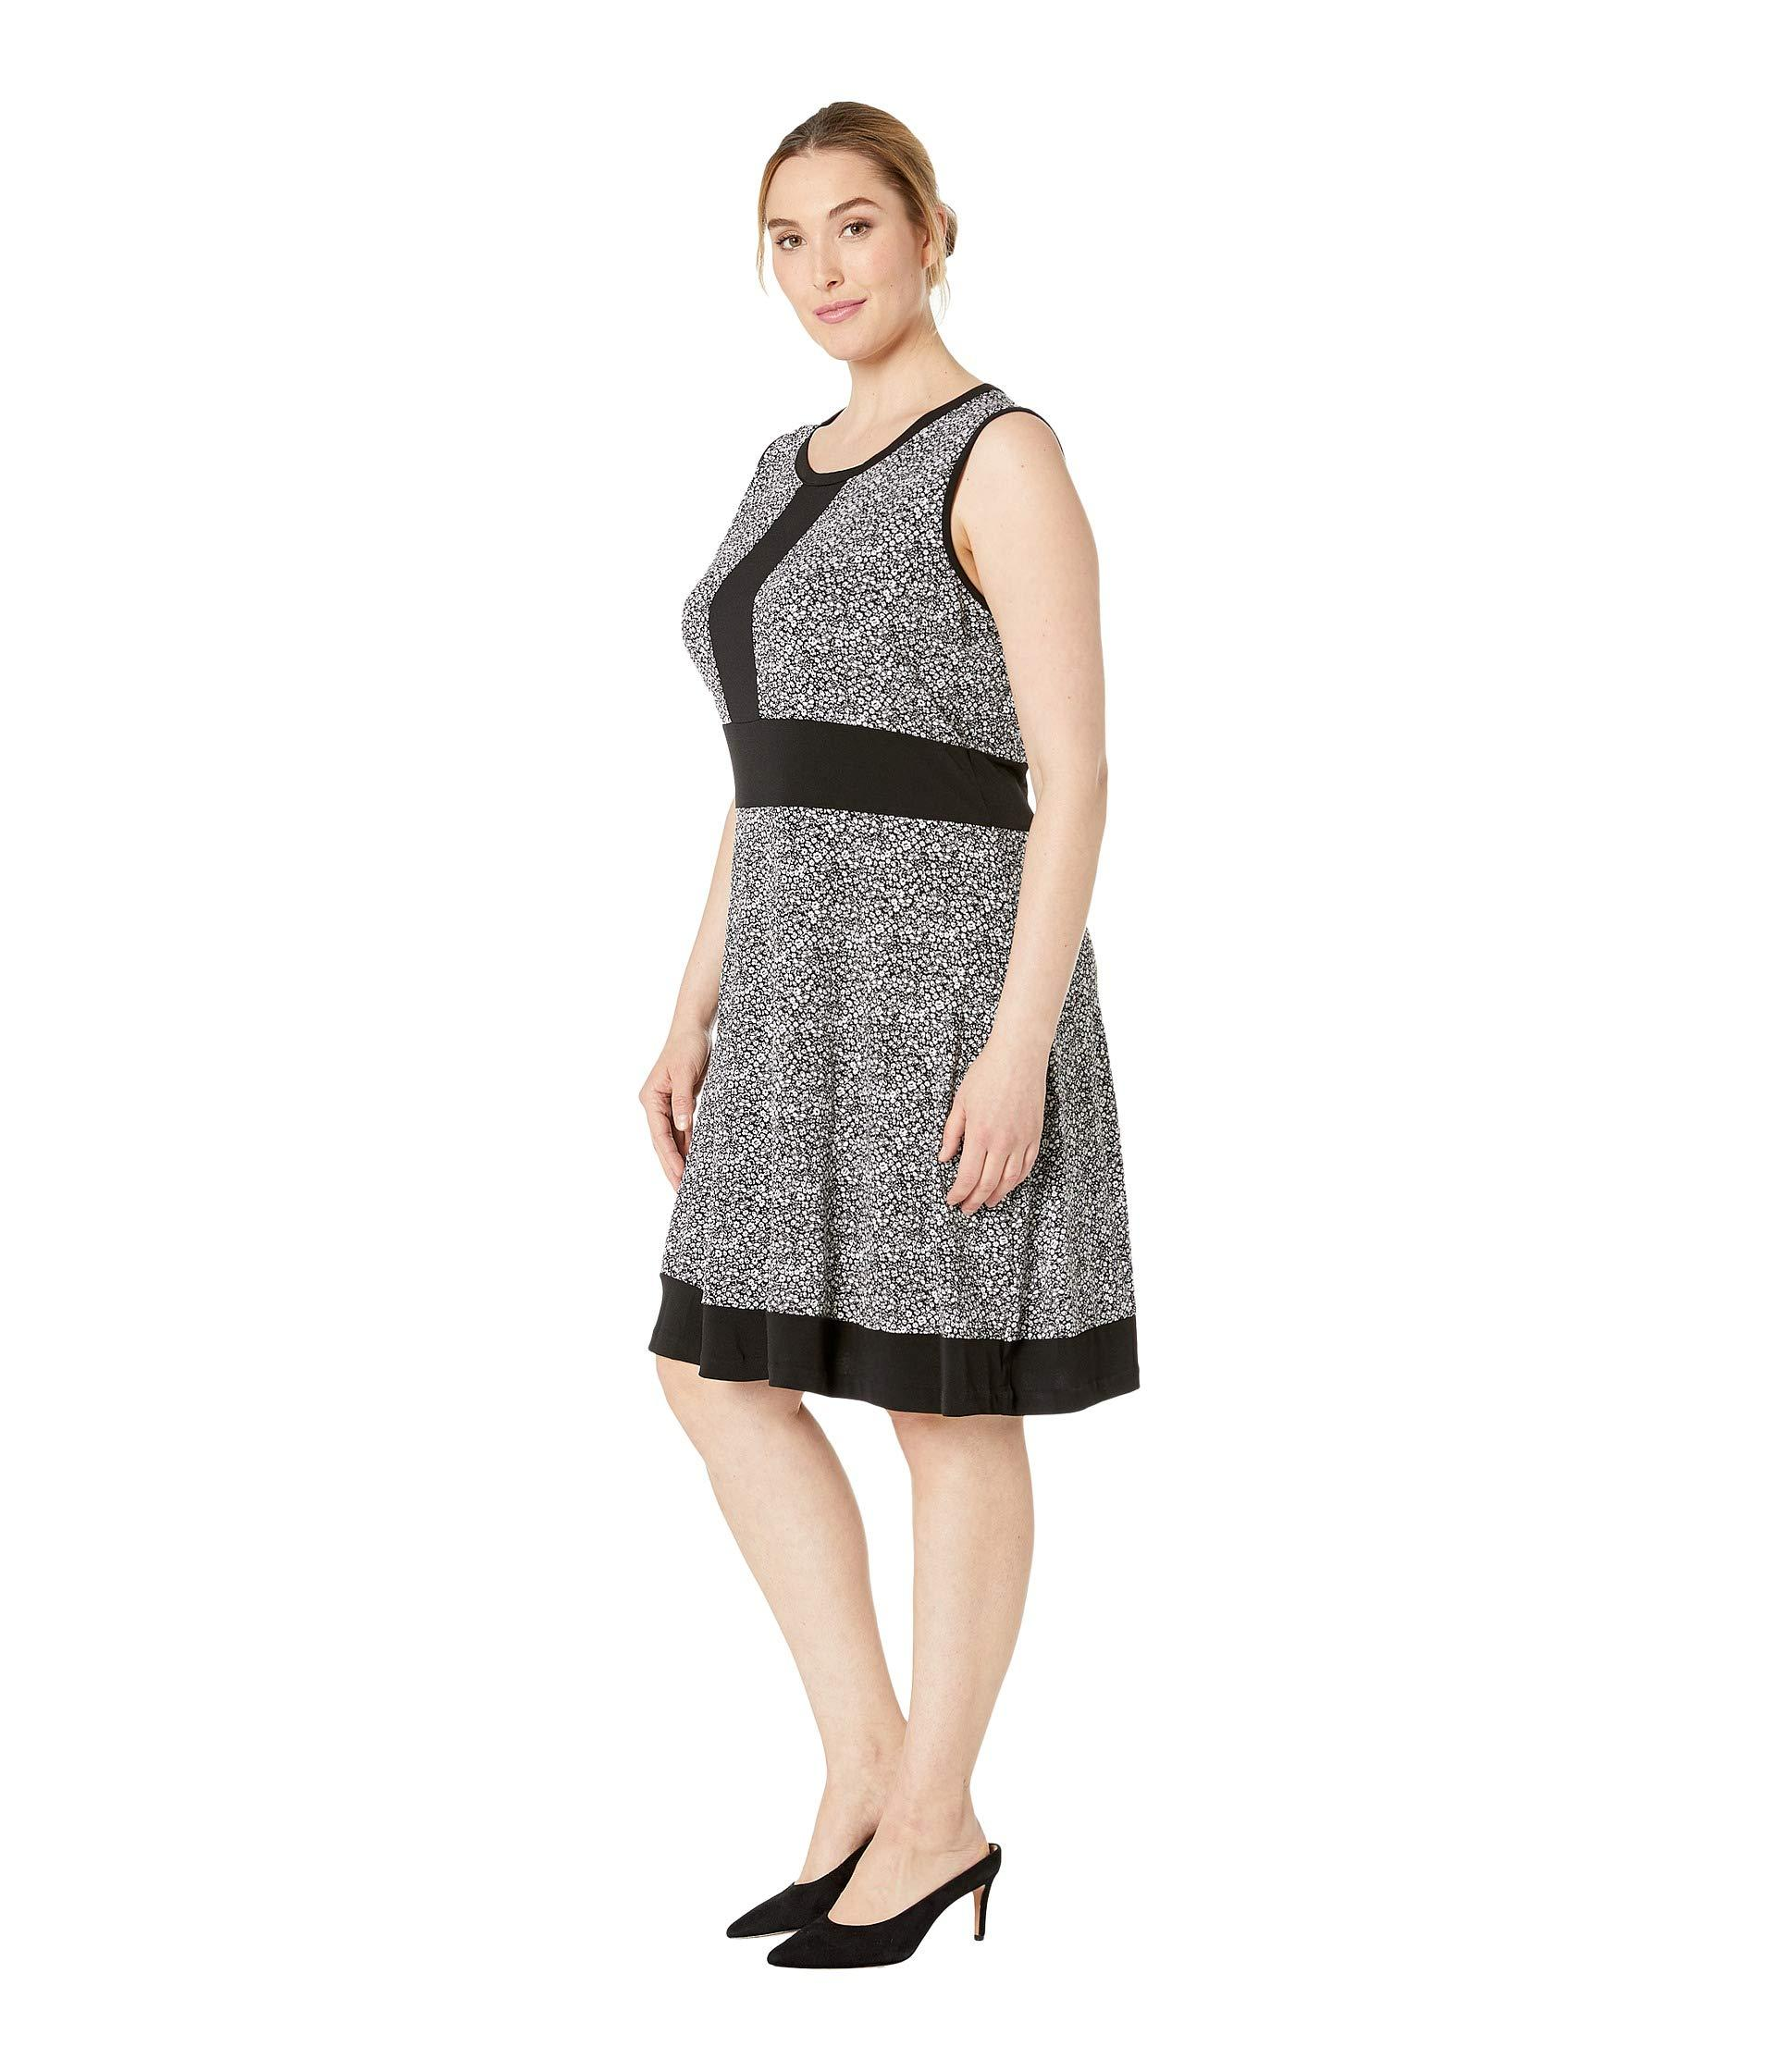 f289a6c7d09 Lyst - MICHAEL Michael Kors Plus Size Spring Sleeveless Border Dress (black  white) Women s Dress in Black